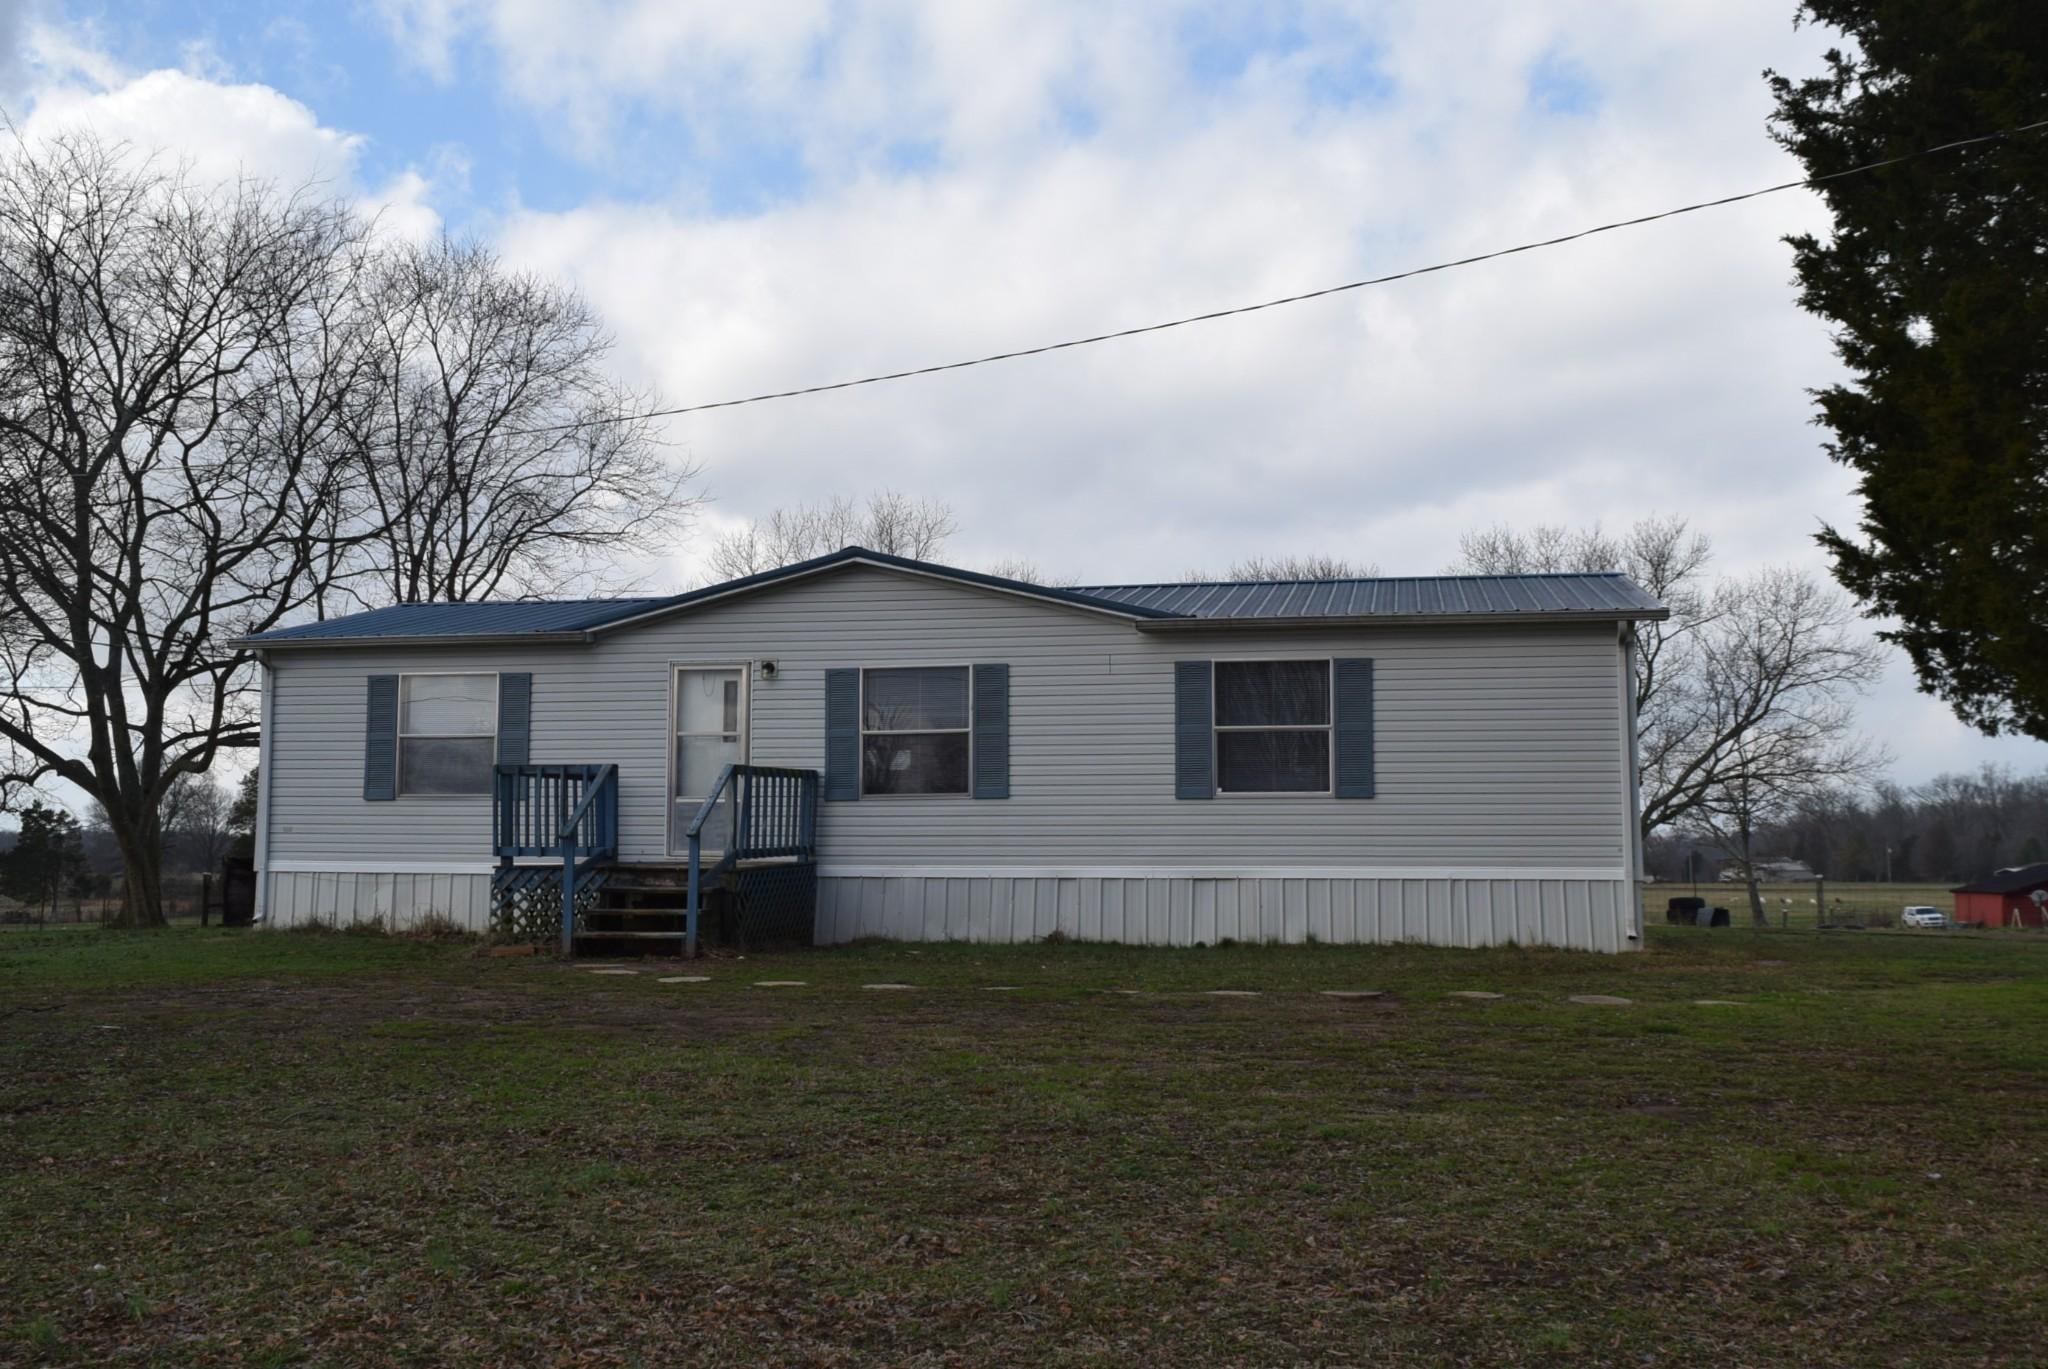 193 Goolsby Rd, Morrison, TN 37357 - Morrison, TN real estate listing